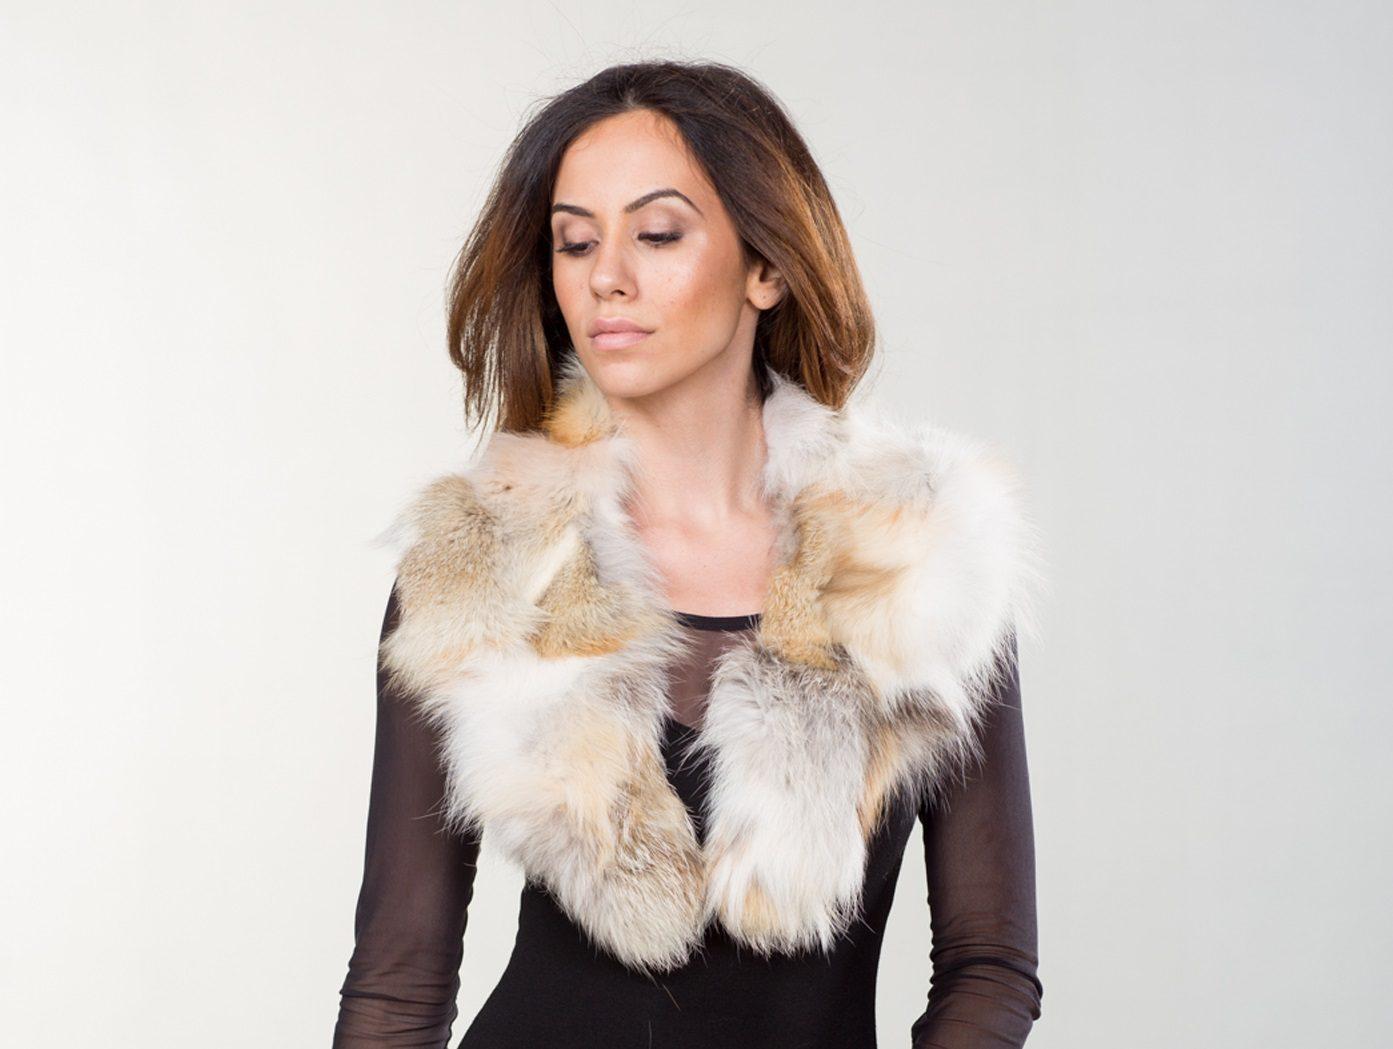 b17a6cd2cf122 Red and White Fox Fur Collar I Made of Real Fox Fur I Haute Acorn